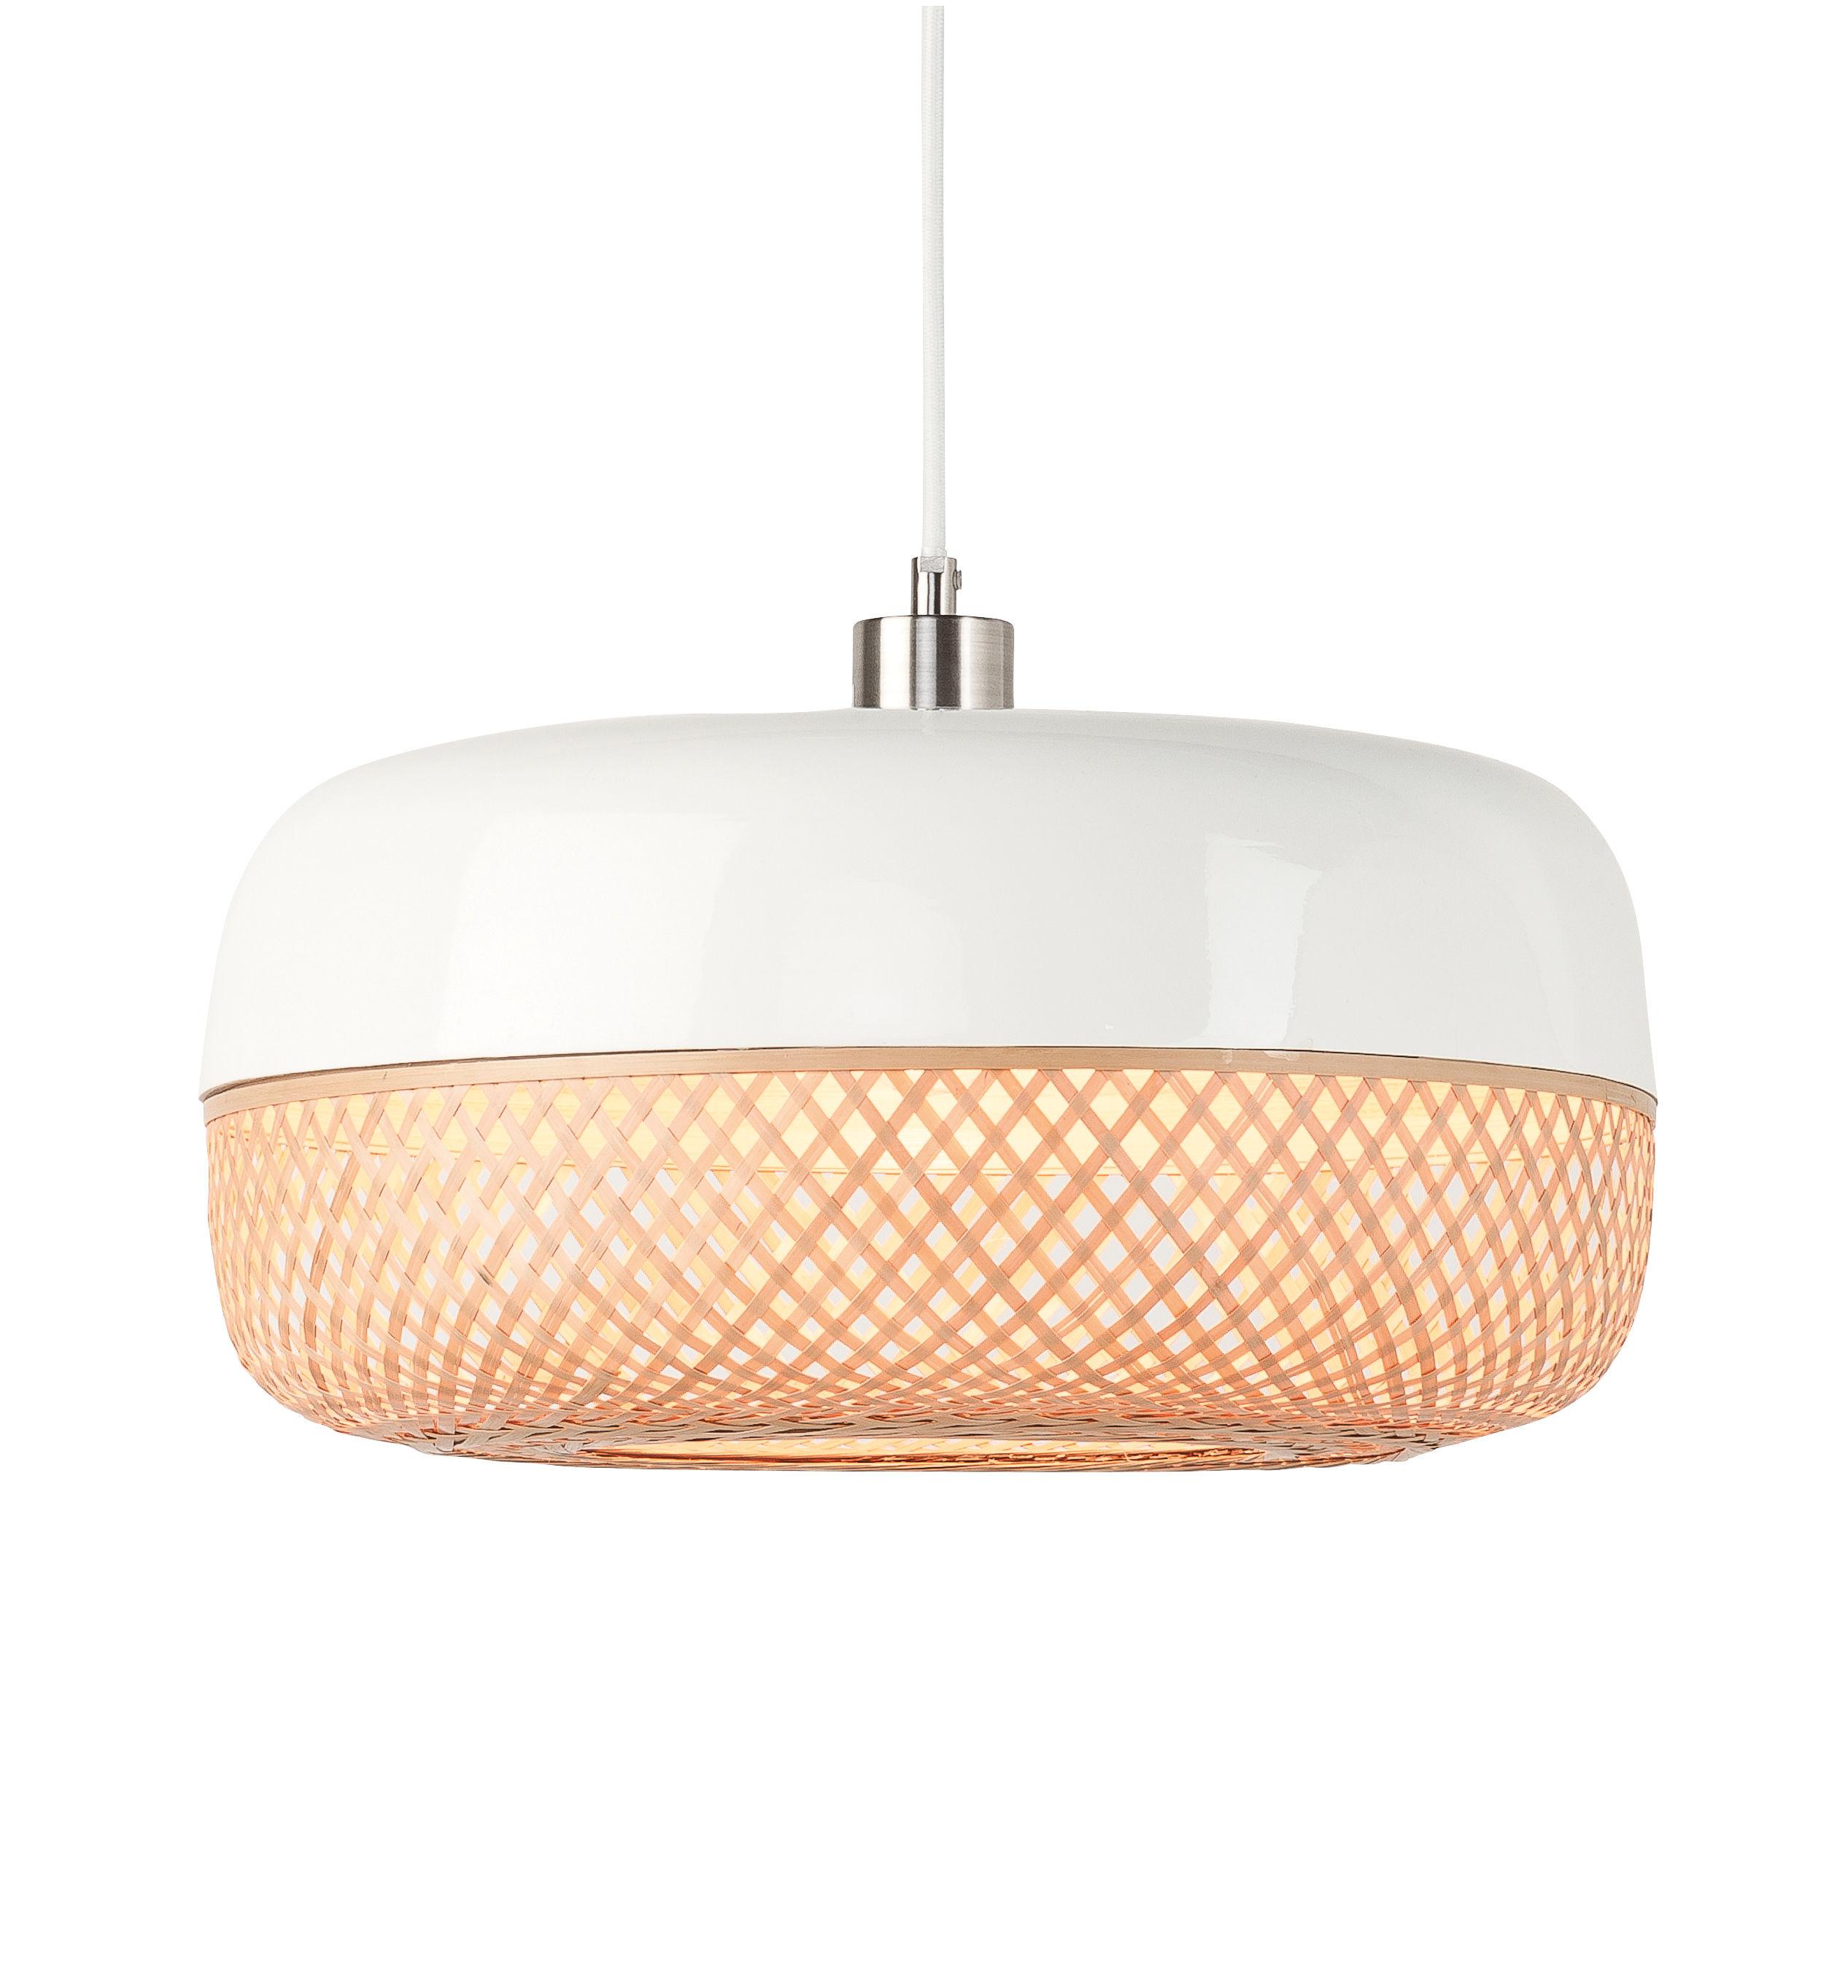 Lighting - Pendant Lighting - Mekong Pendant - / Bamboo - Ø 40 x H 22 cm by GOOD&MOJO - Ø 40 x H 22 cm / Bamboo & white - Natural bamboo, Painted bamboo